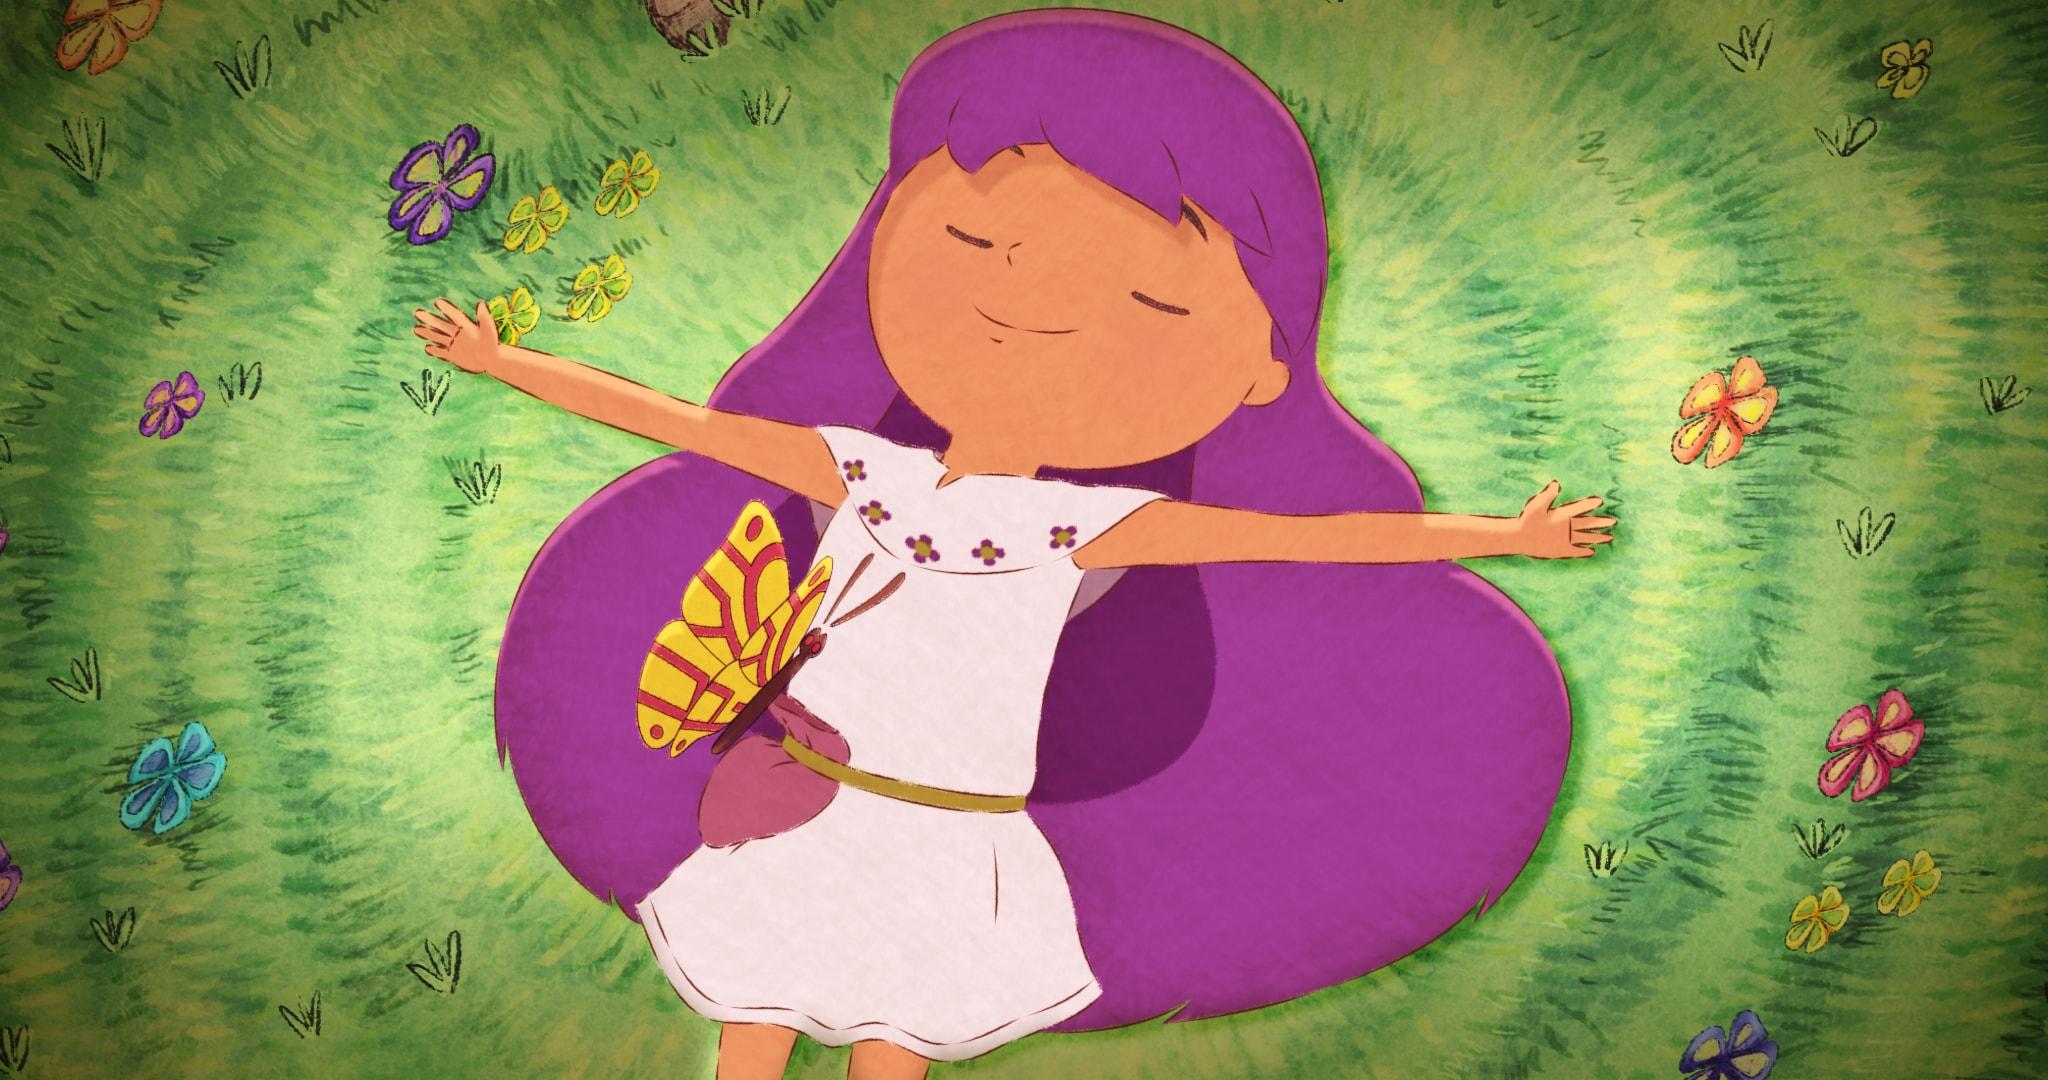 'El Libro de Lila' Is the Woke Animated Movie We Need Right Now